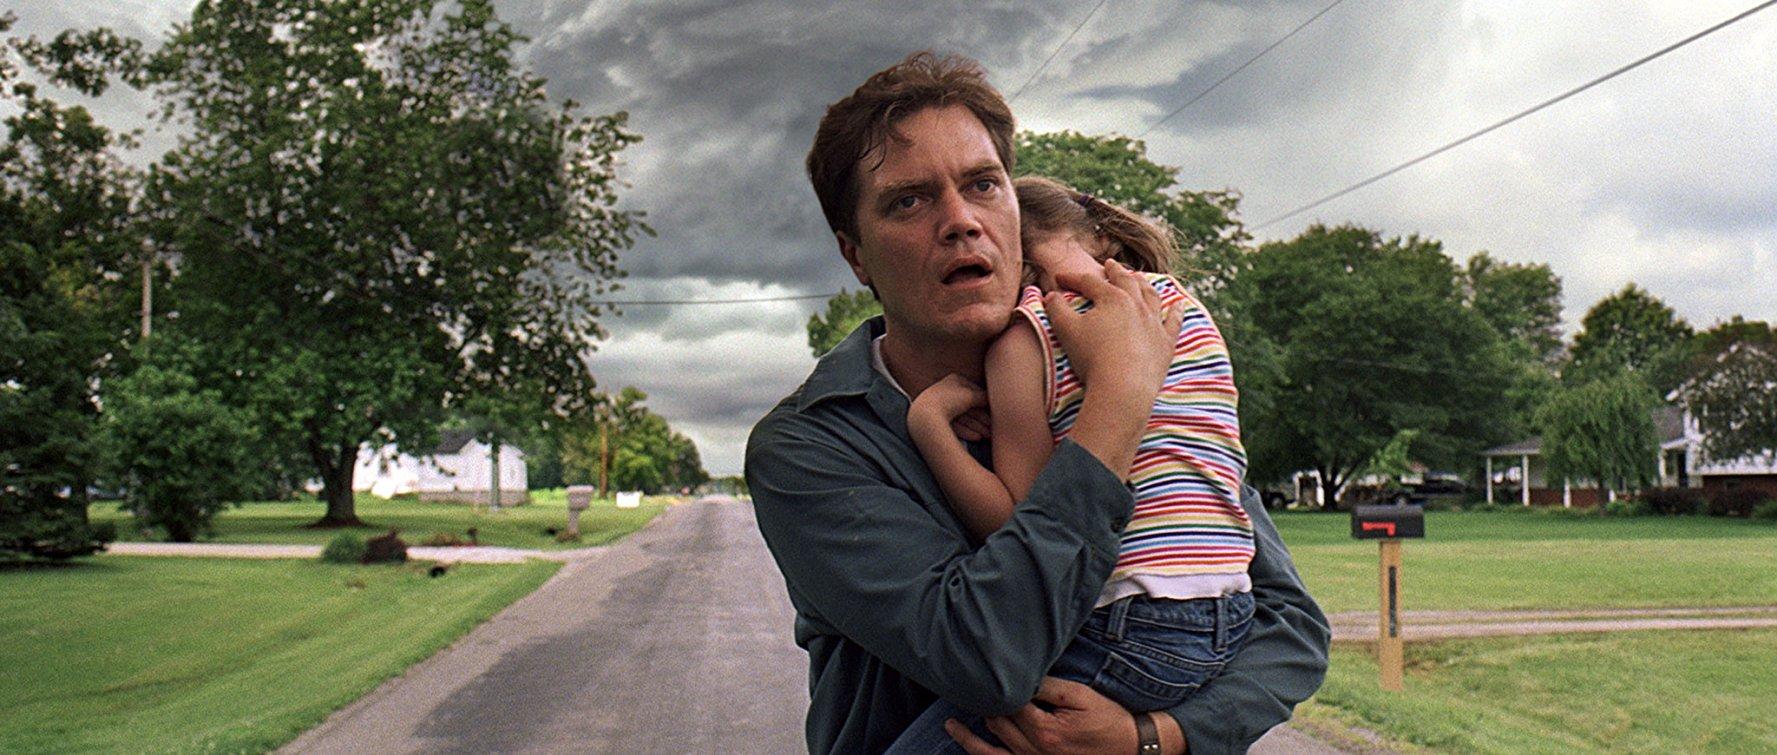 Take Shelter (2011) Jeff Nichols